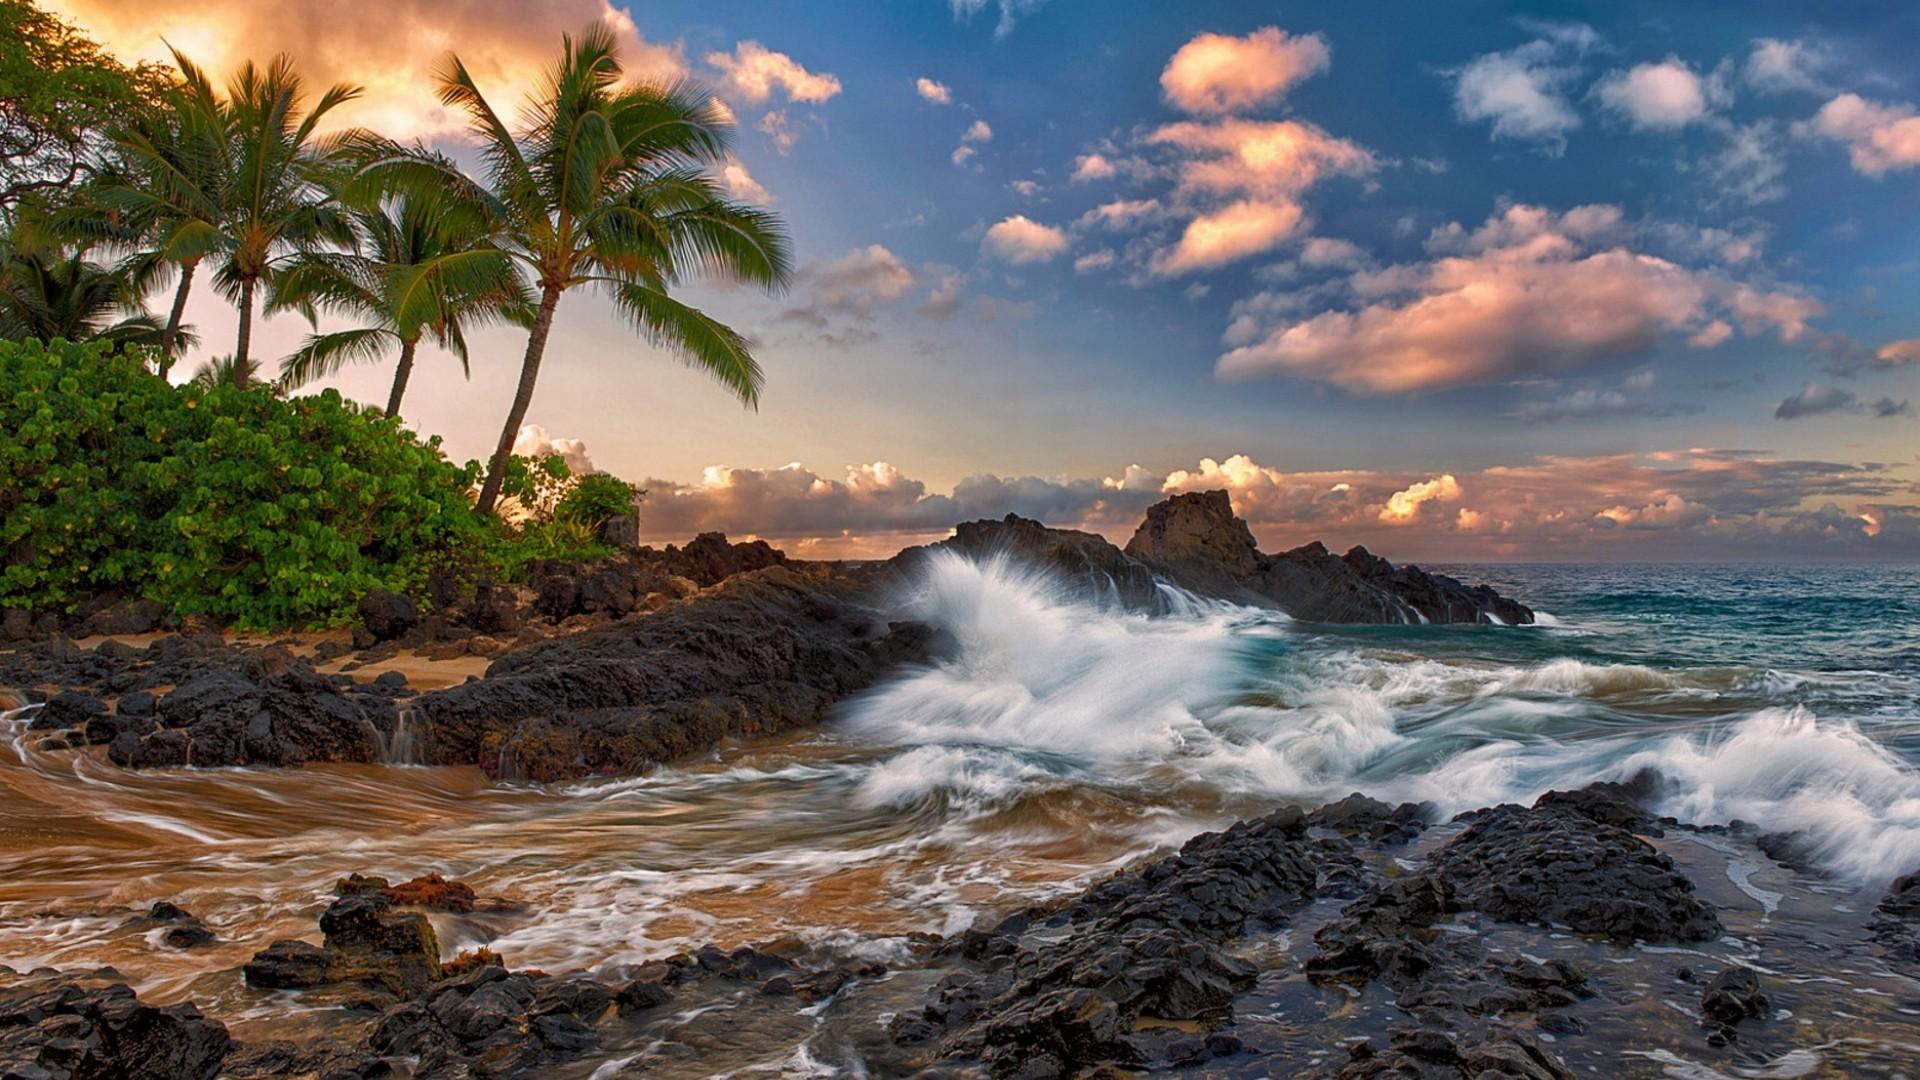 Us state hawaii maui island ocaen rocks wallpaper synergy community us state hawaii maui island ocaen rocks wallpaper publicscrutiny Gallery